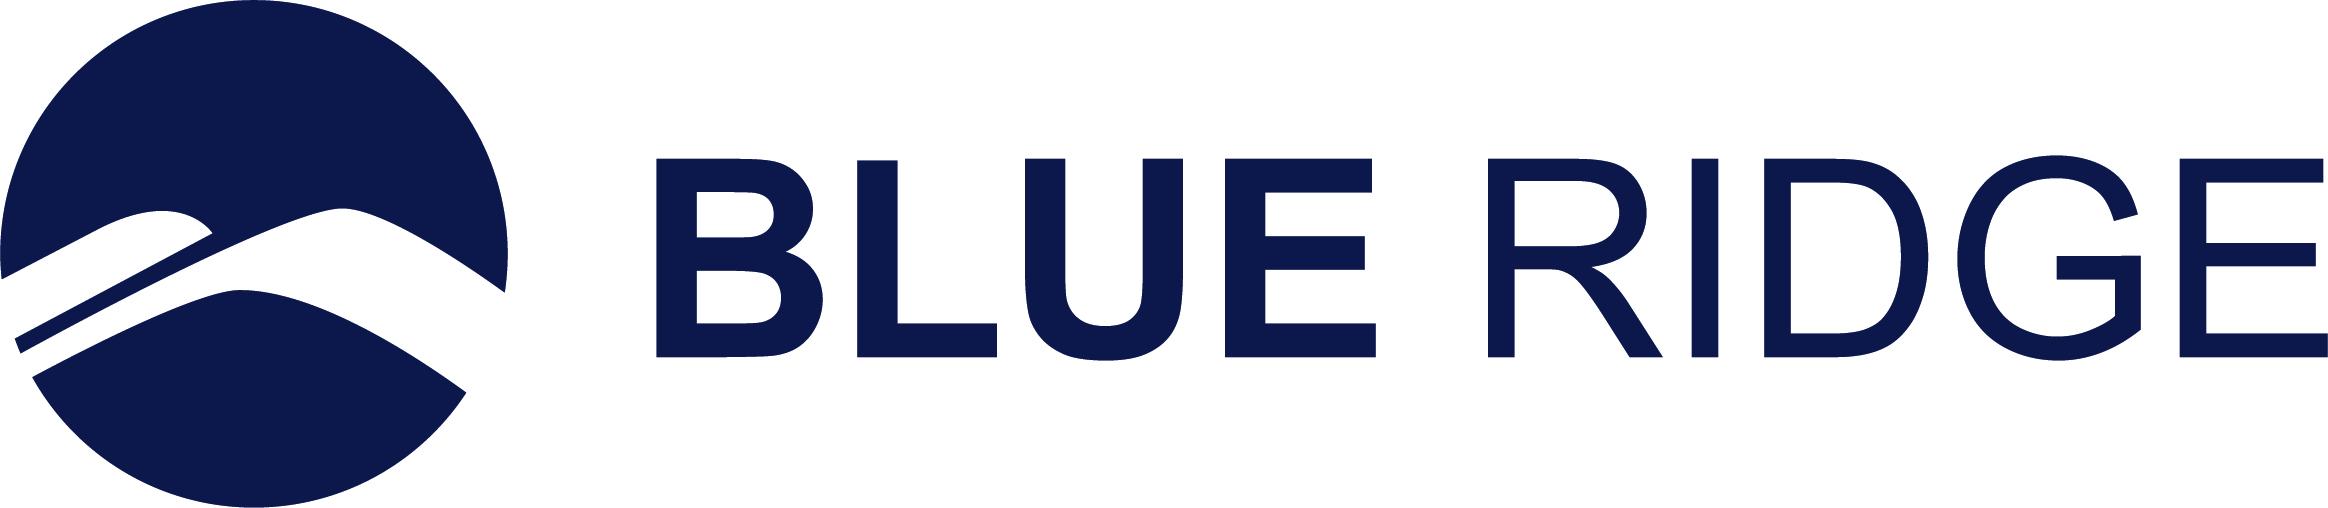 Blue Ridge Advances Cloud-Native Platform to Unlock Best-in-Class Demand Sensing and Shaping Capabilities for Discrete Manufacturers